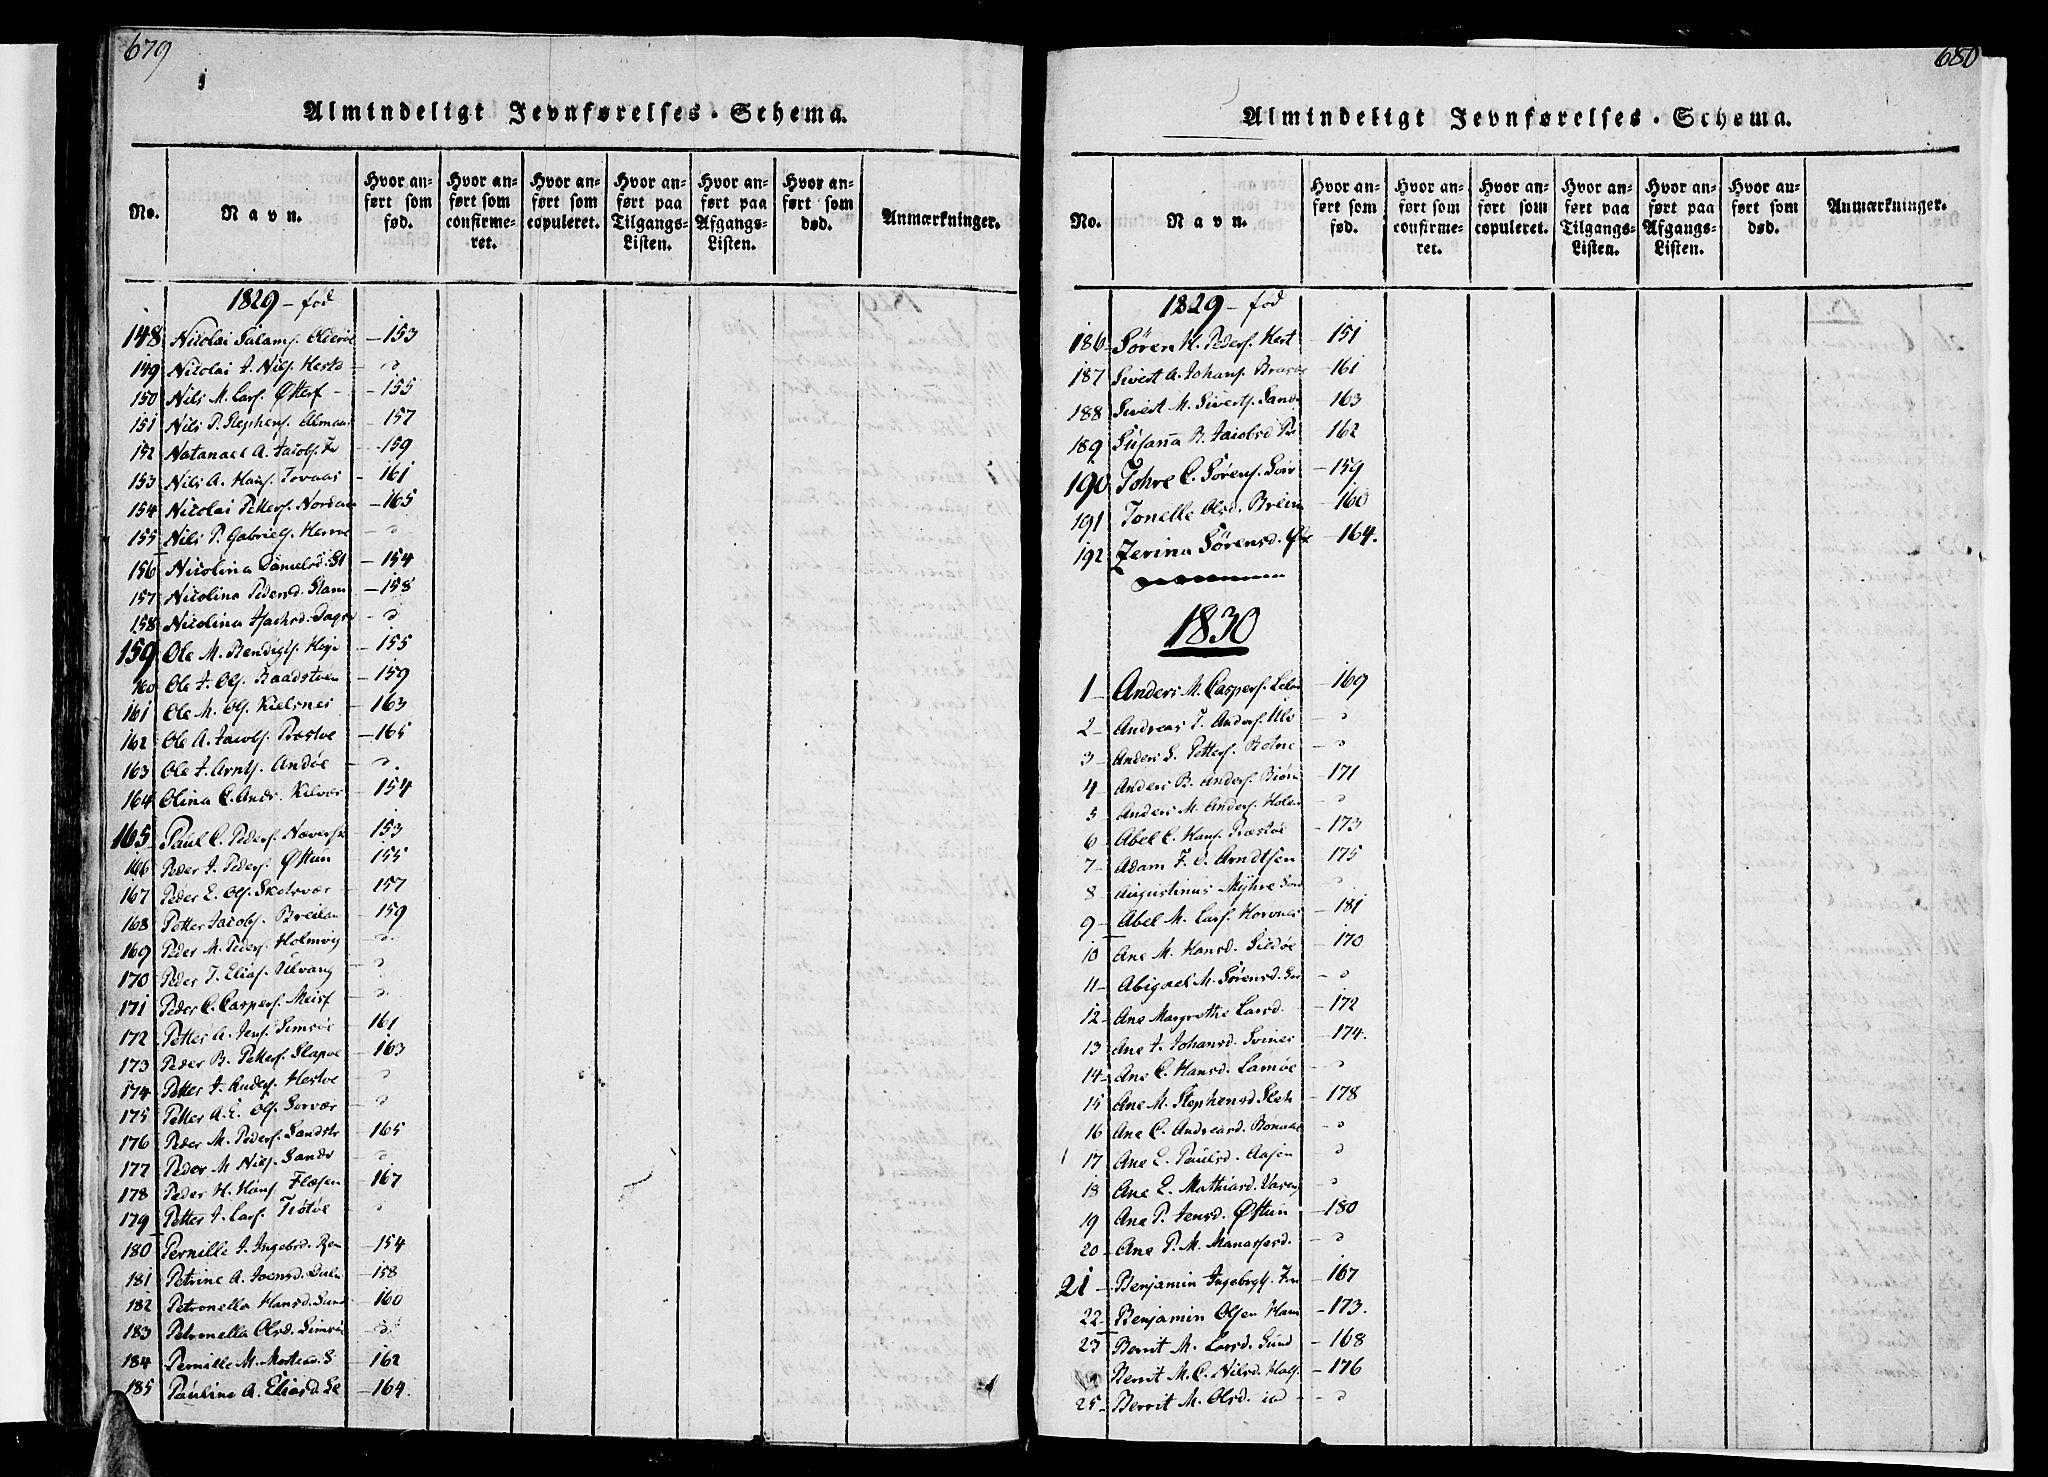 SAT, Ministerialprotokoller, klokkerbøker og fødselsregistre - Nordland, 830/L0445: Ministerialbok nr. 830A09, 1820-1830, s. 679-680